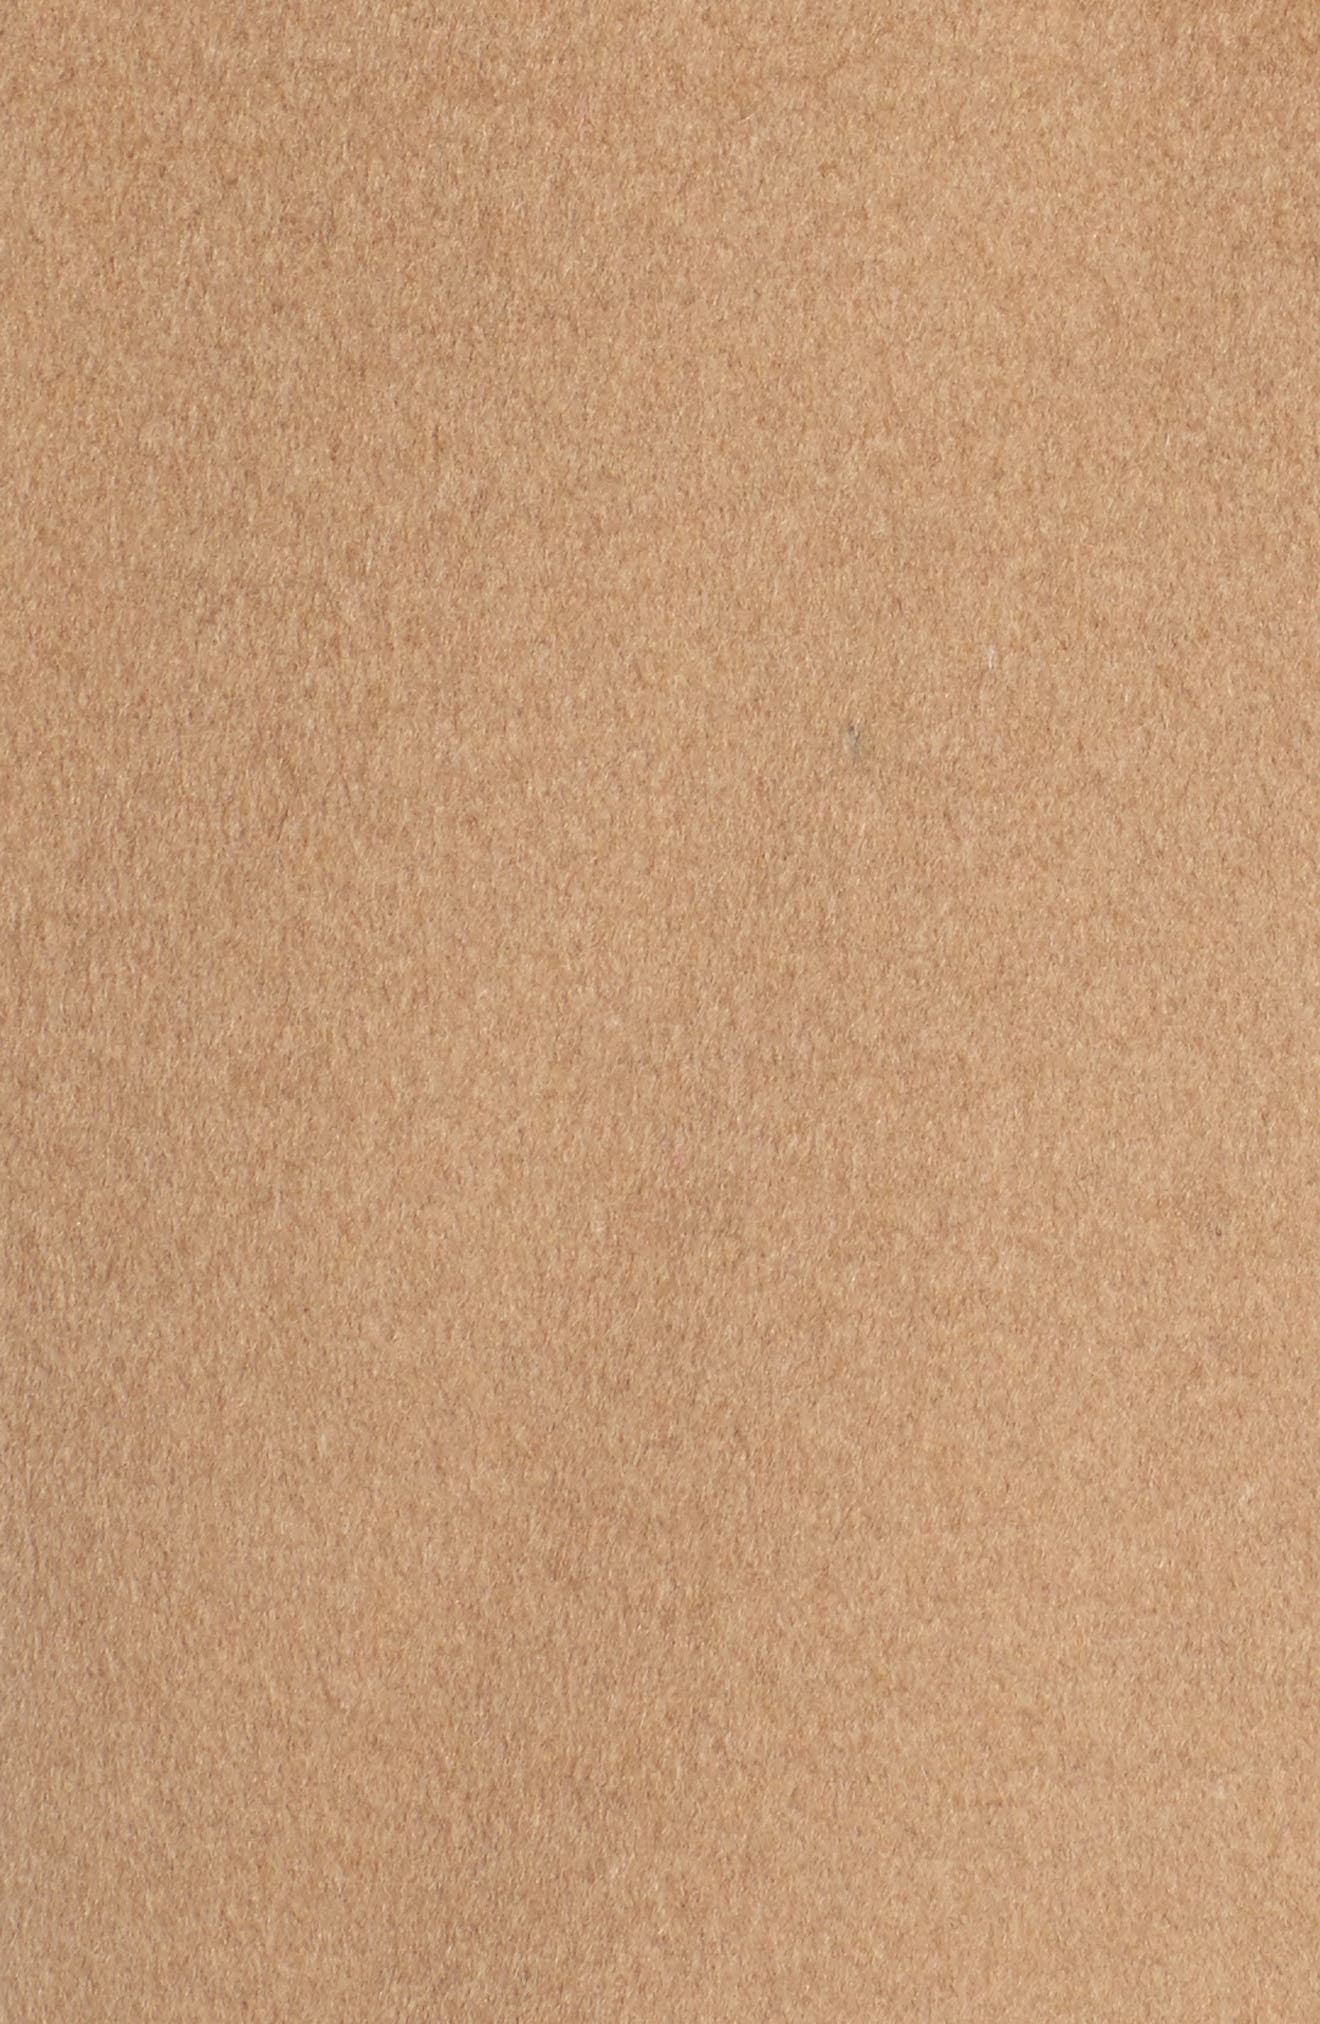 DKNY Wool Blend Shawl Collar Wrap Coat,                             Alternate thumbnail 6, color,                             252